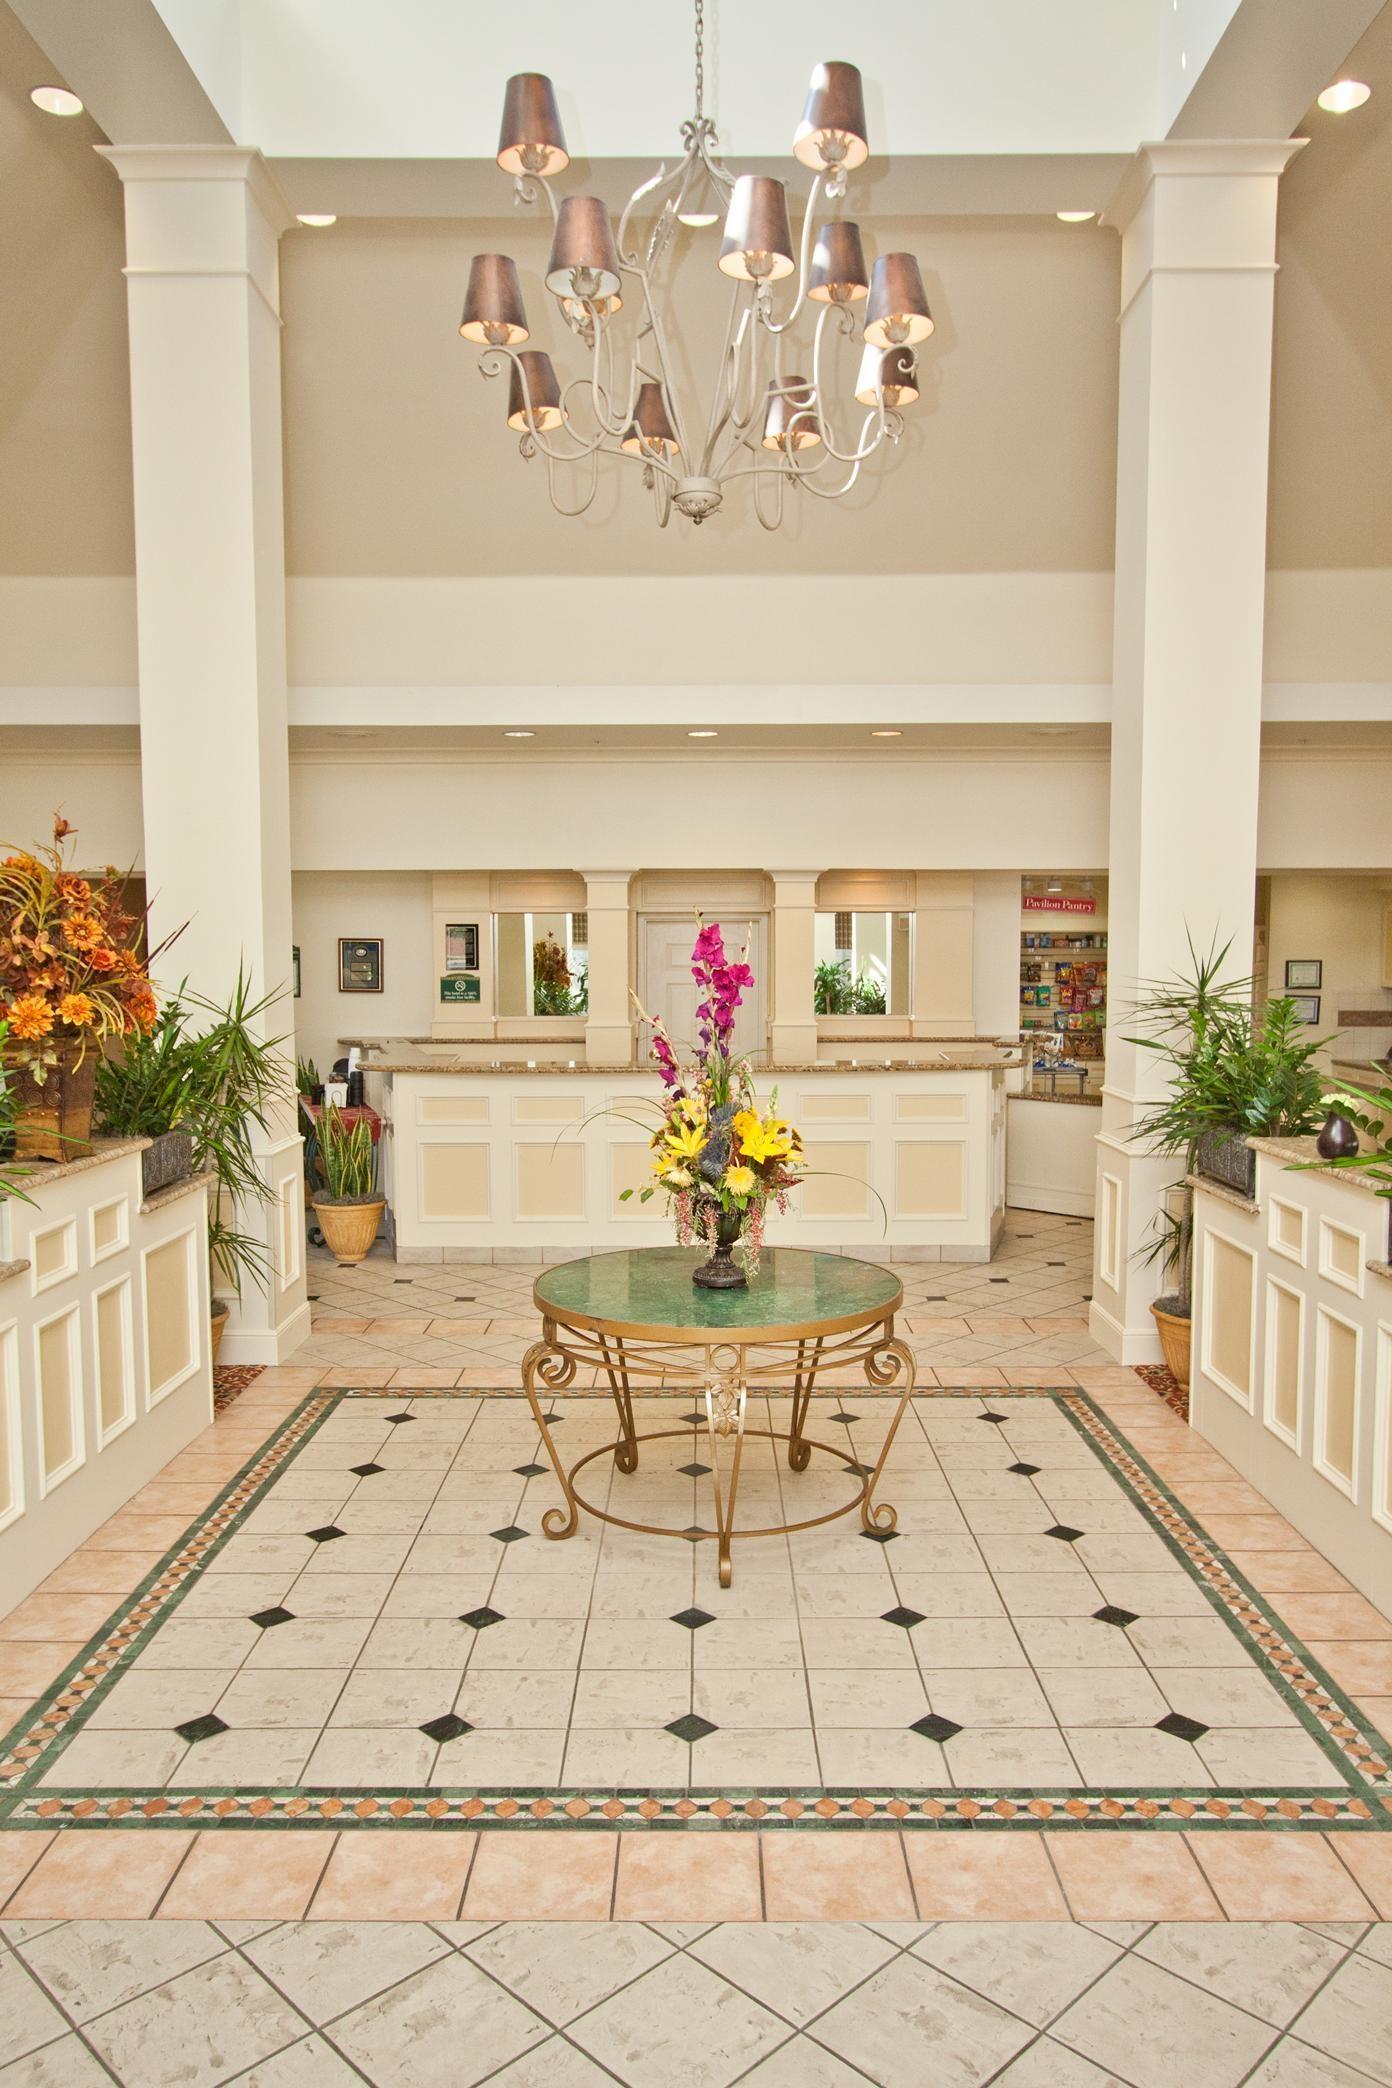 Hilton Garden Inn Dallas Addison Addison Tx Business Directory